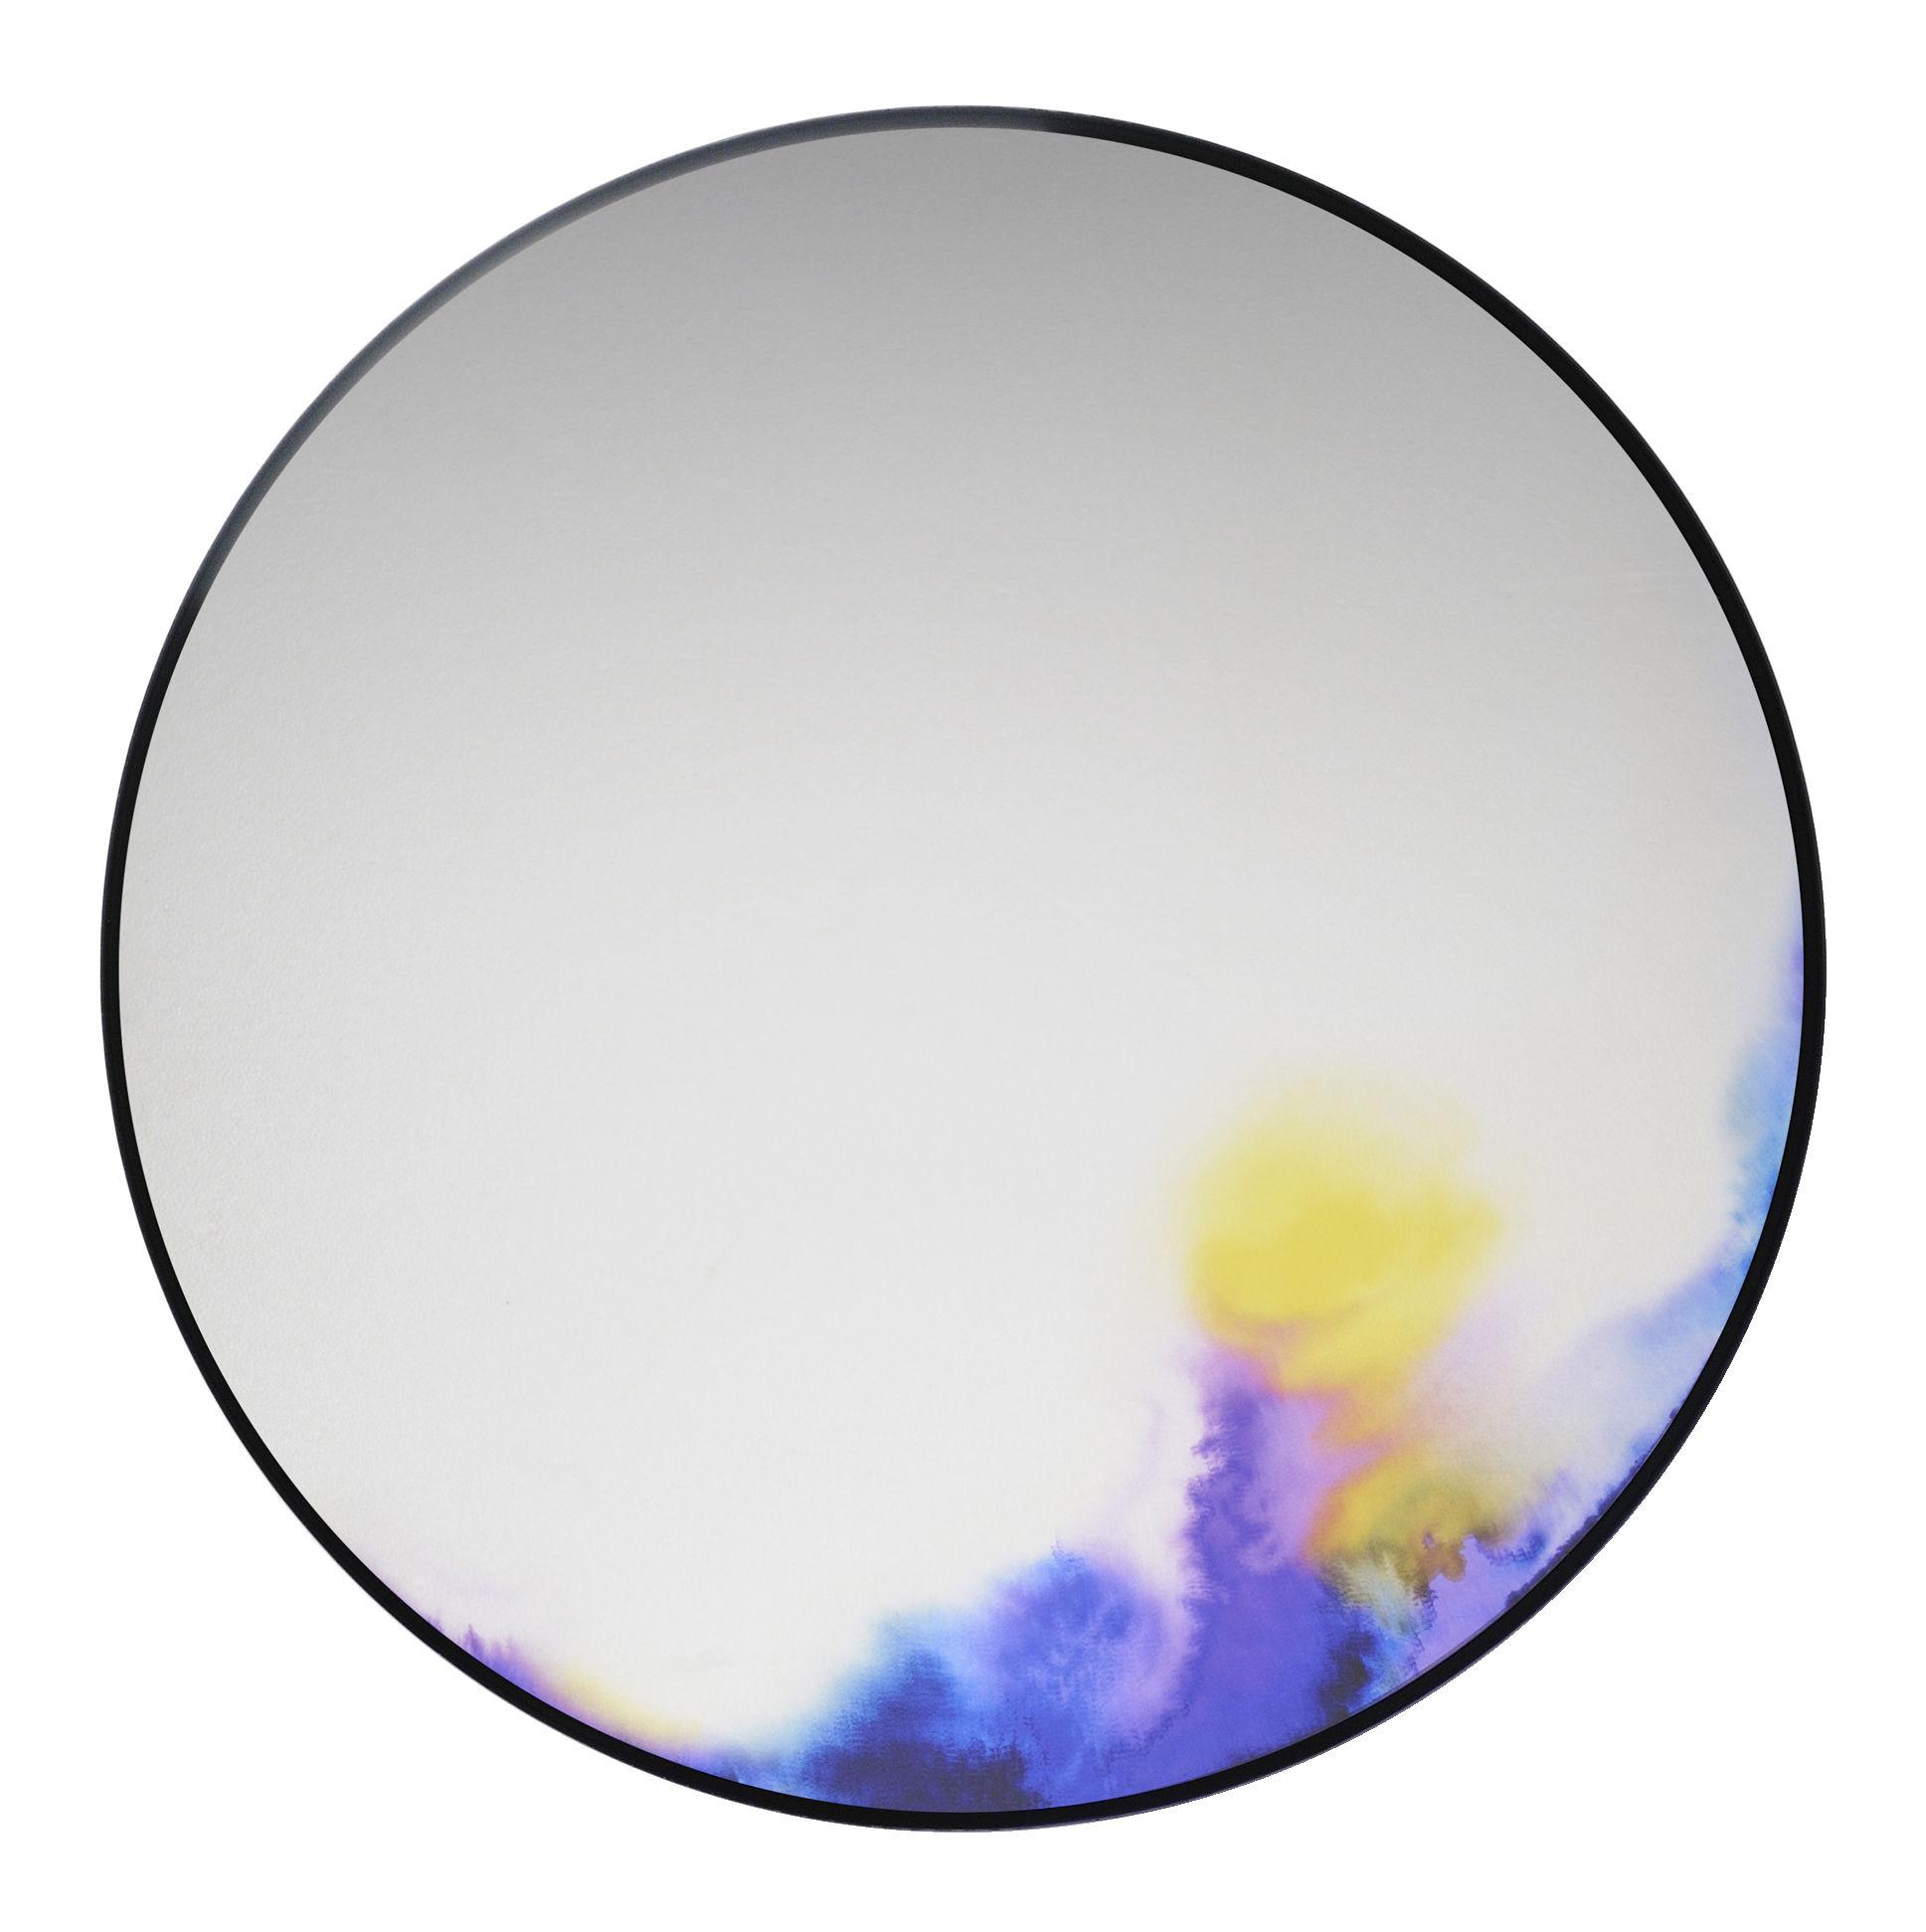 Möbel - Spiegel - Francis Wandspiegel Ø 60 cm - Petite Friture - Blaues Aquarell - bemaltes Aluminium, Glas